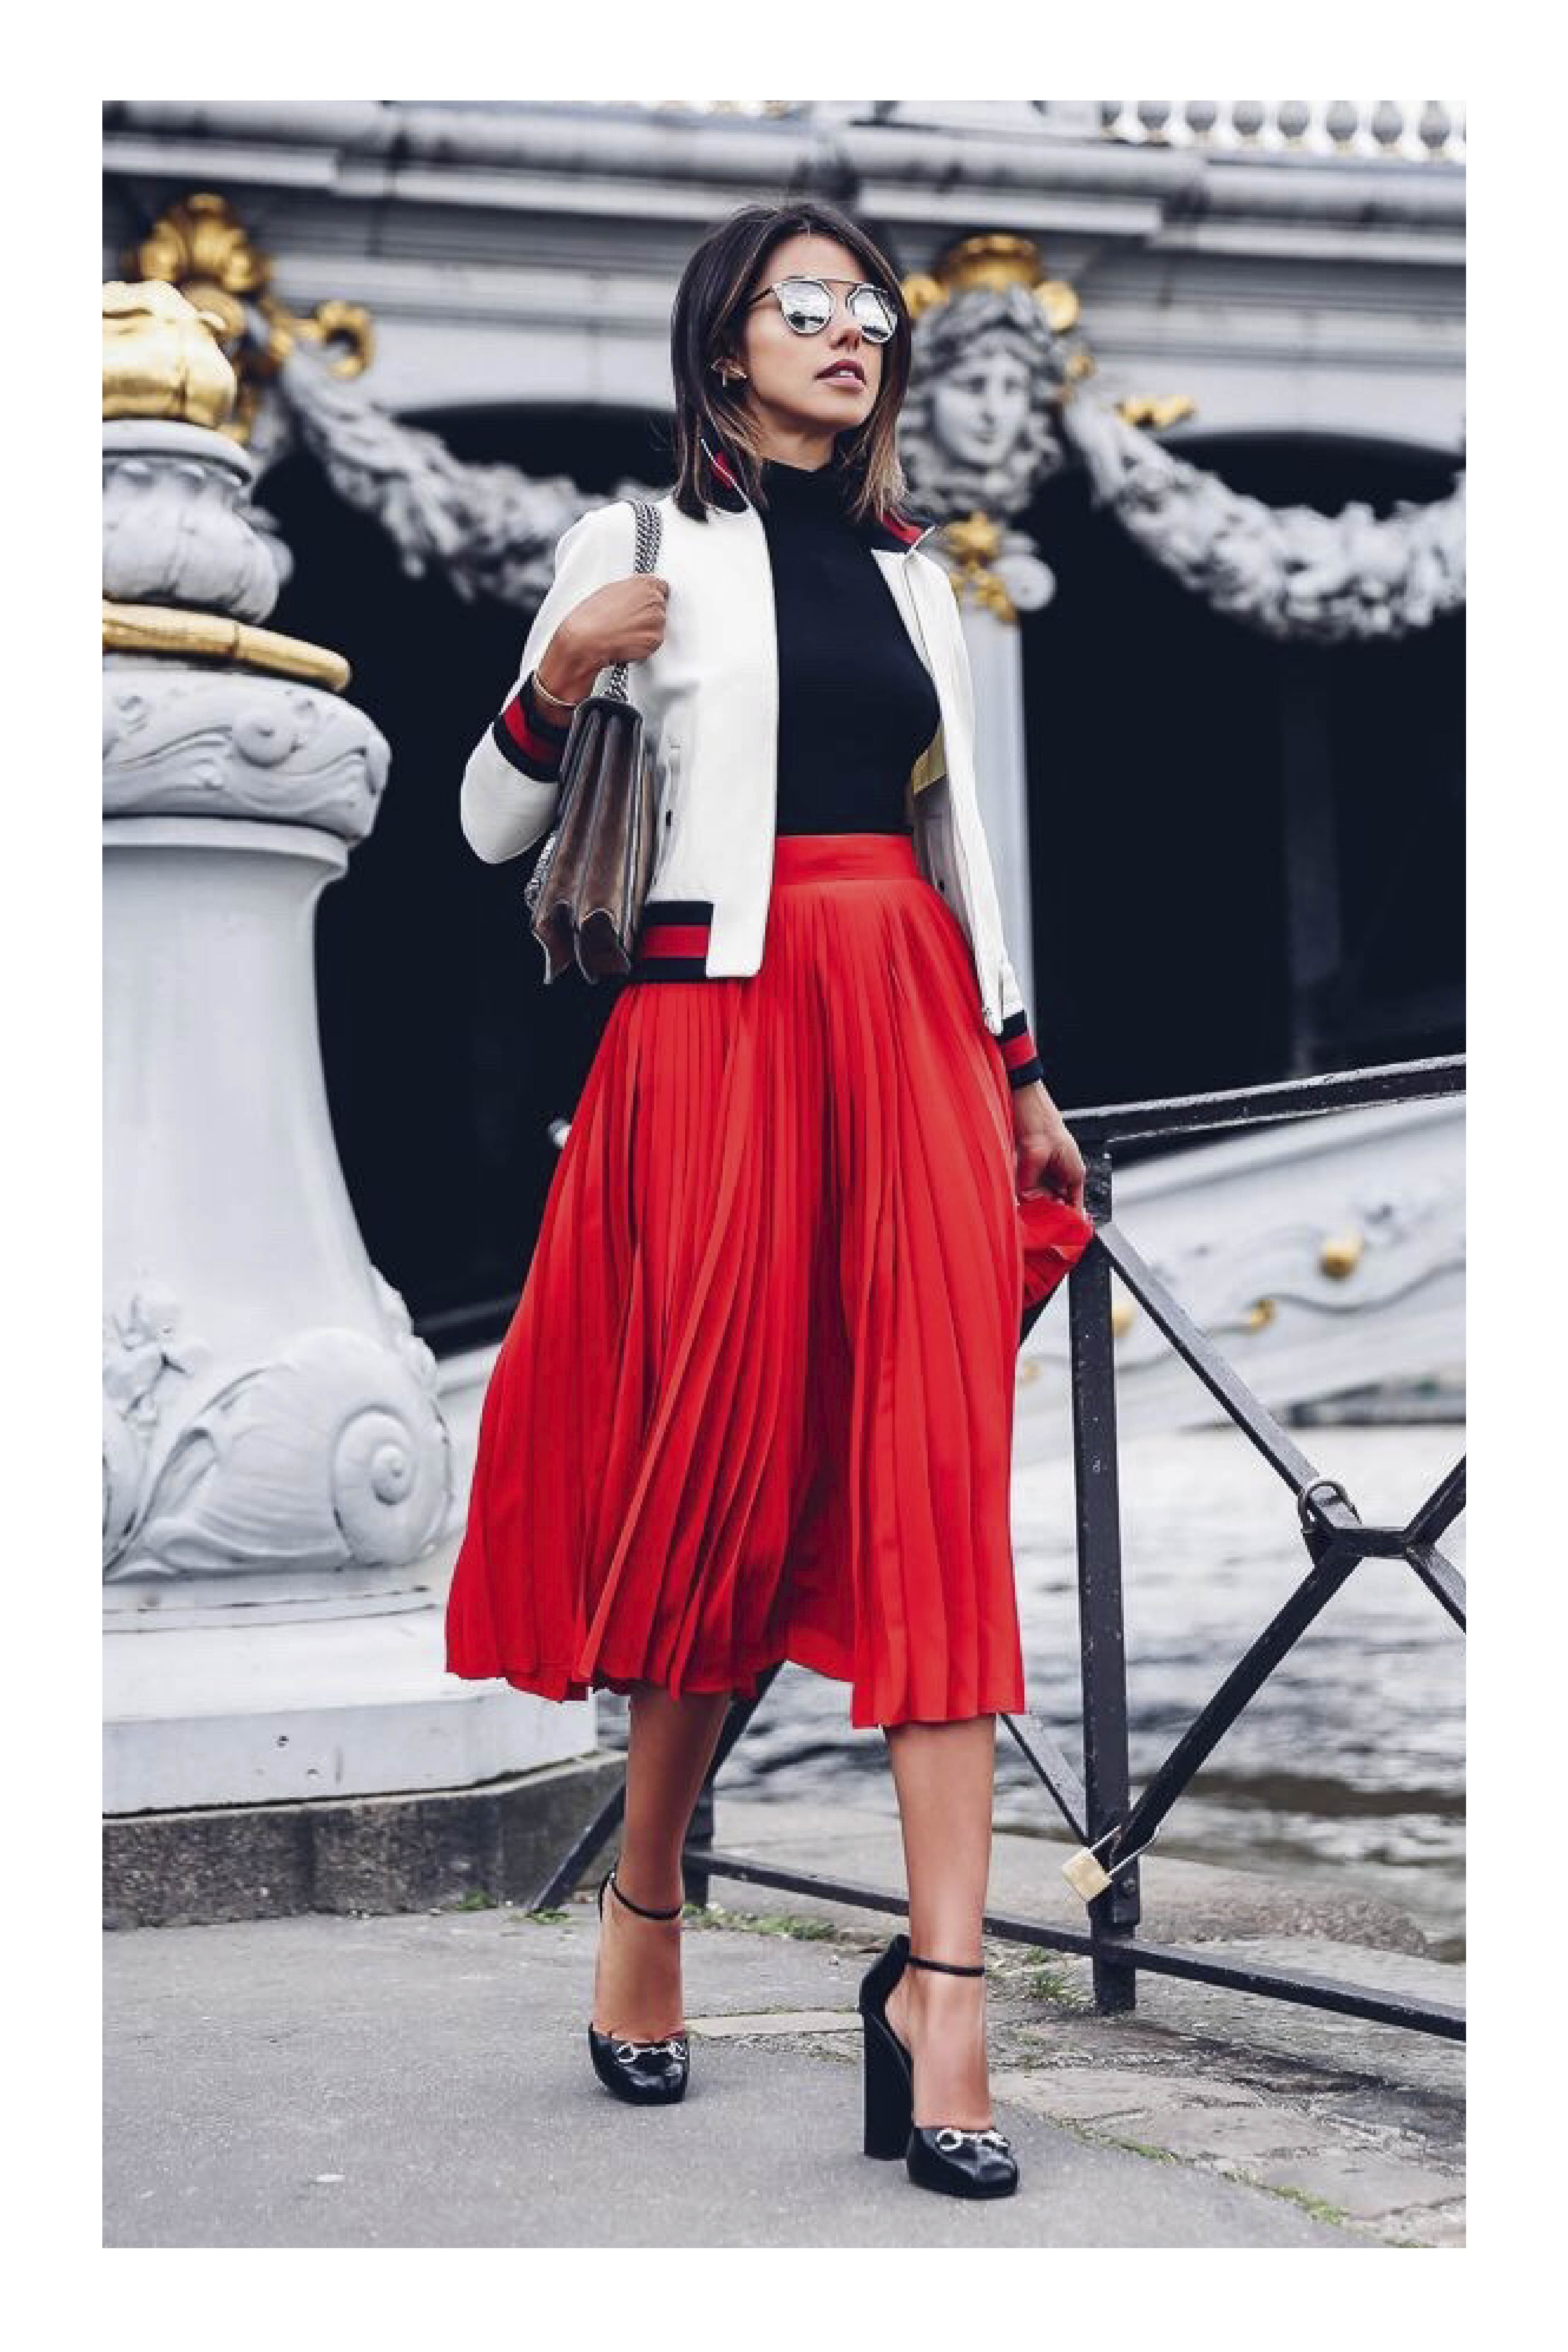 8ed3a2196a 6 Tips para vestir bien  TiZKKAmoda  falda  plisada  rojo  zapatos  negro   black  lentes  blusa  chaqueta  look  fashion  bolsa